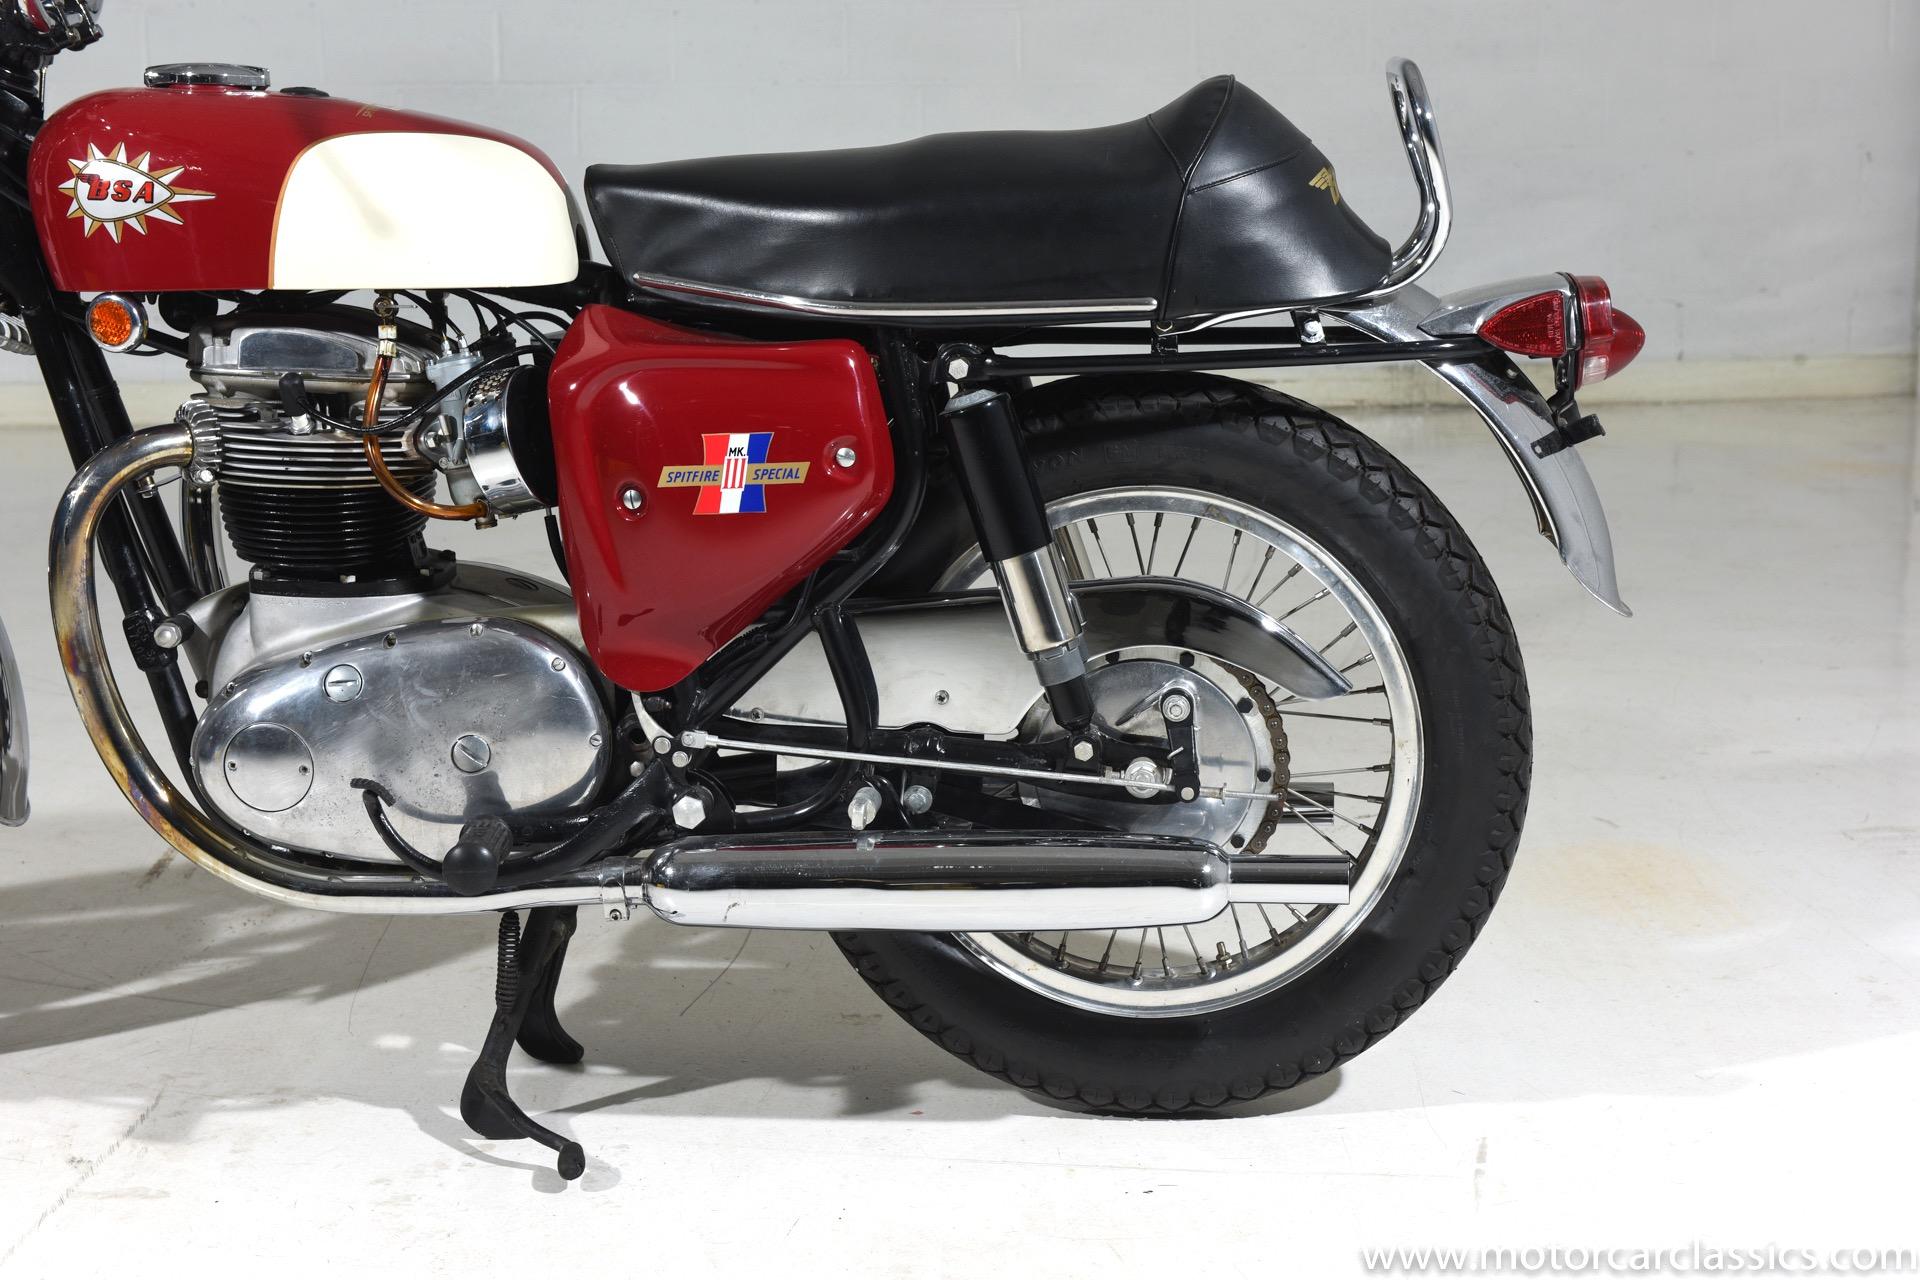 1968 BSA Spitfire Special MKIII